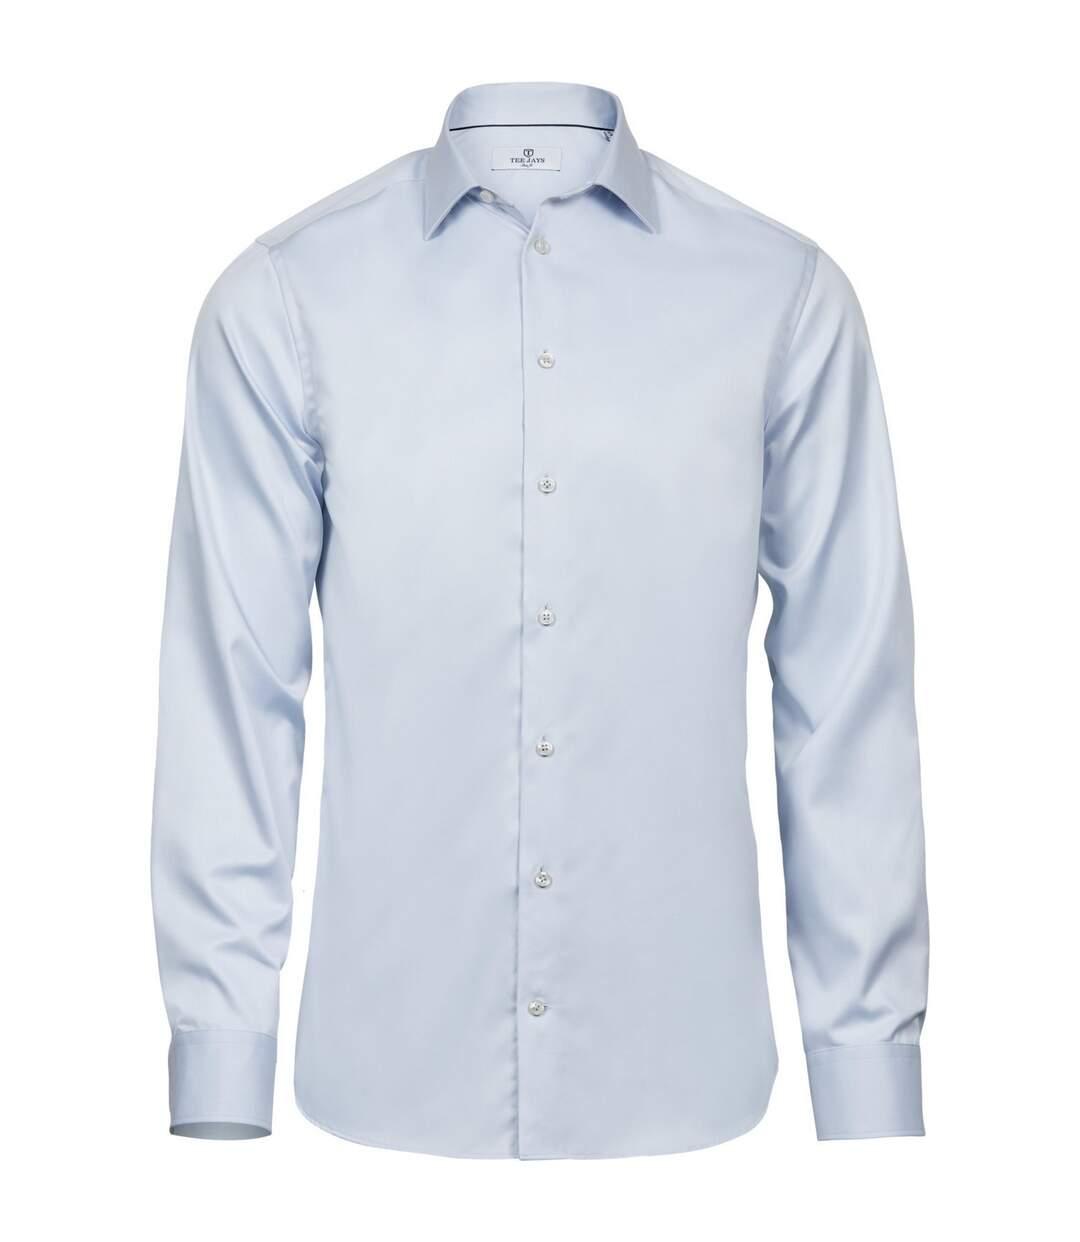 Tee Jays Mens Luxury Slim Fit Long Sleeve Oxford Shirt (Light Blue) - UTPC3485